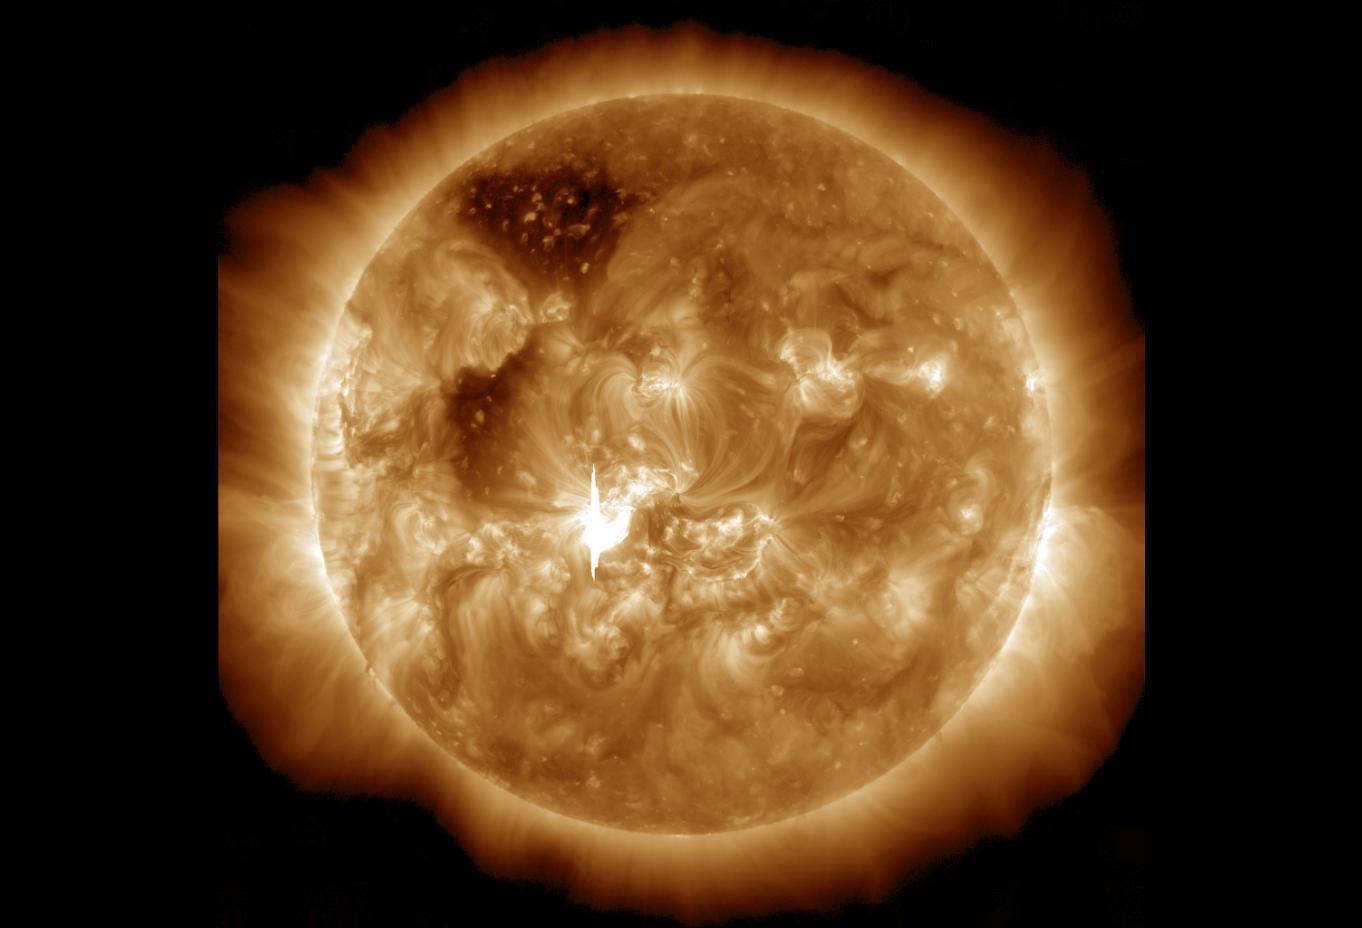 M7.2 Solar Flare on Jan. 7, 2014